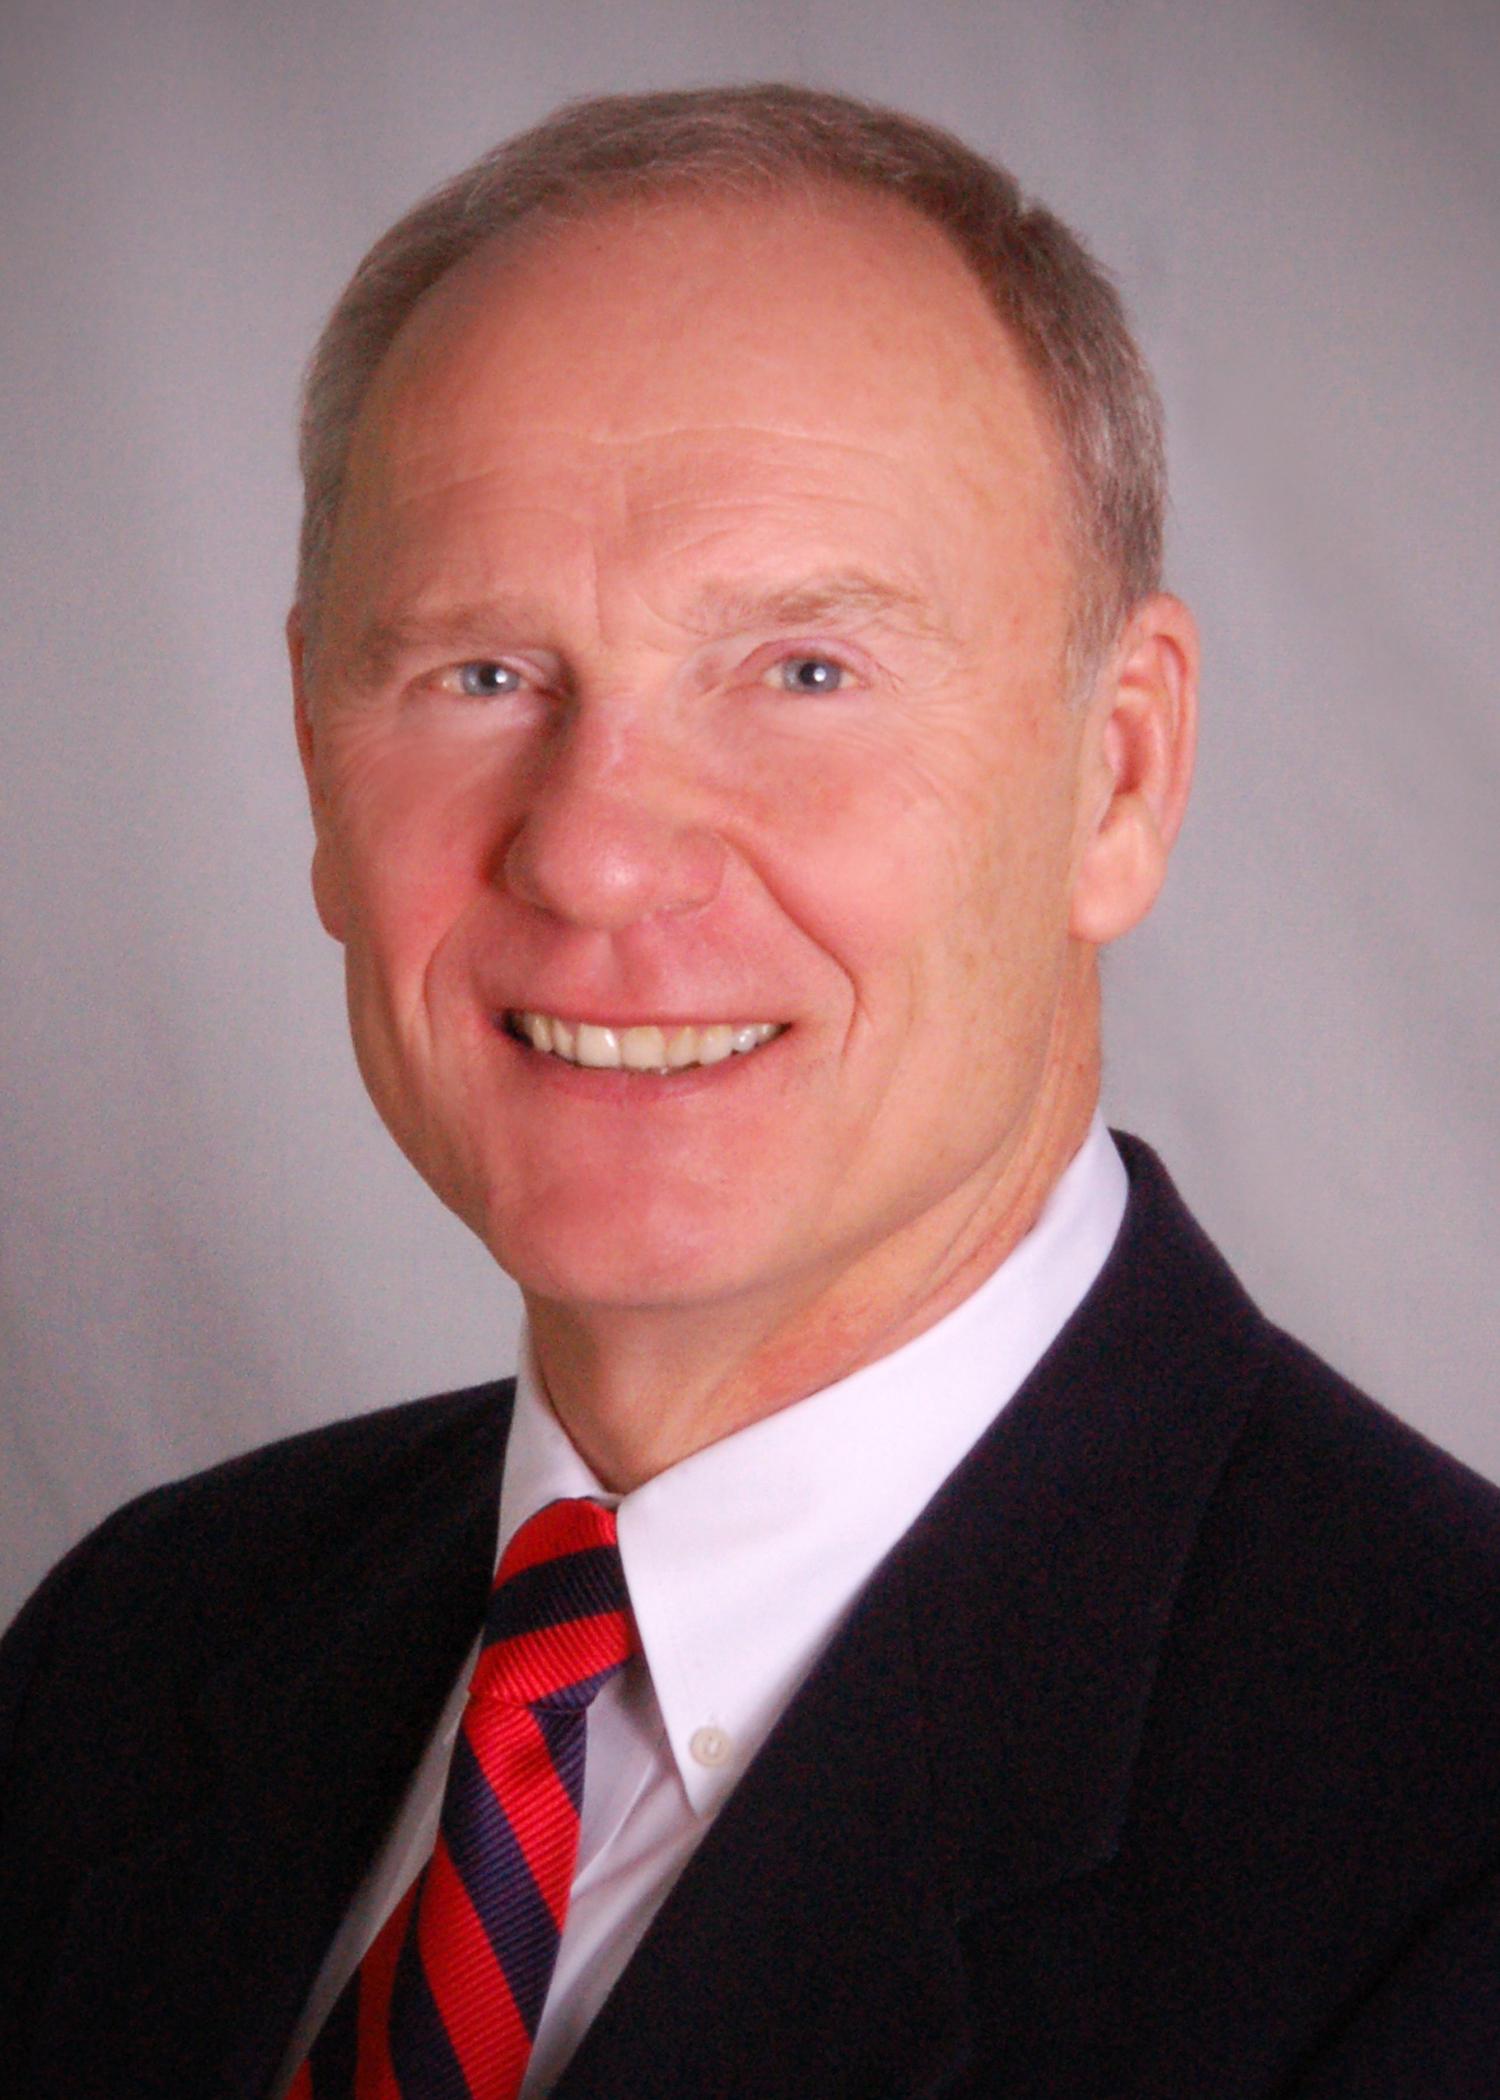 Michael A. Pianowski